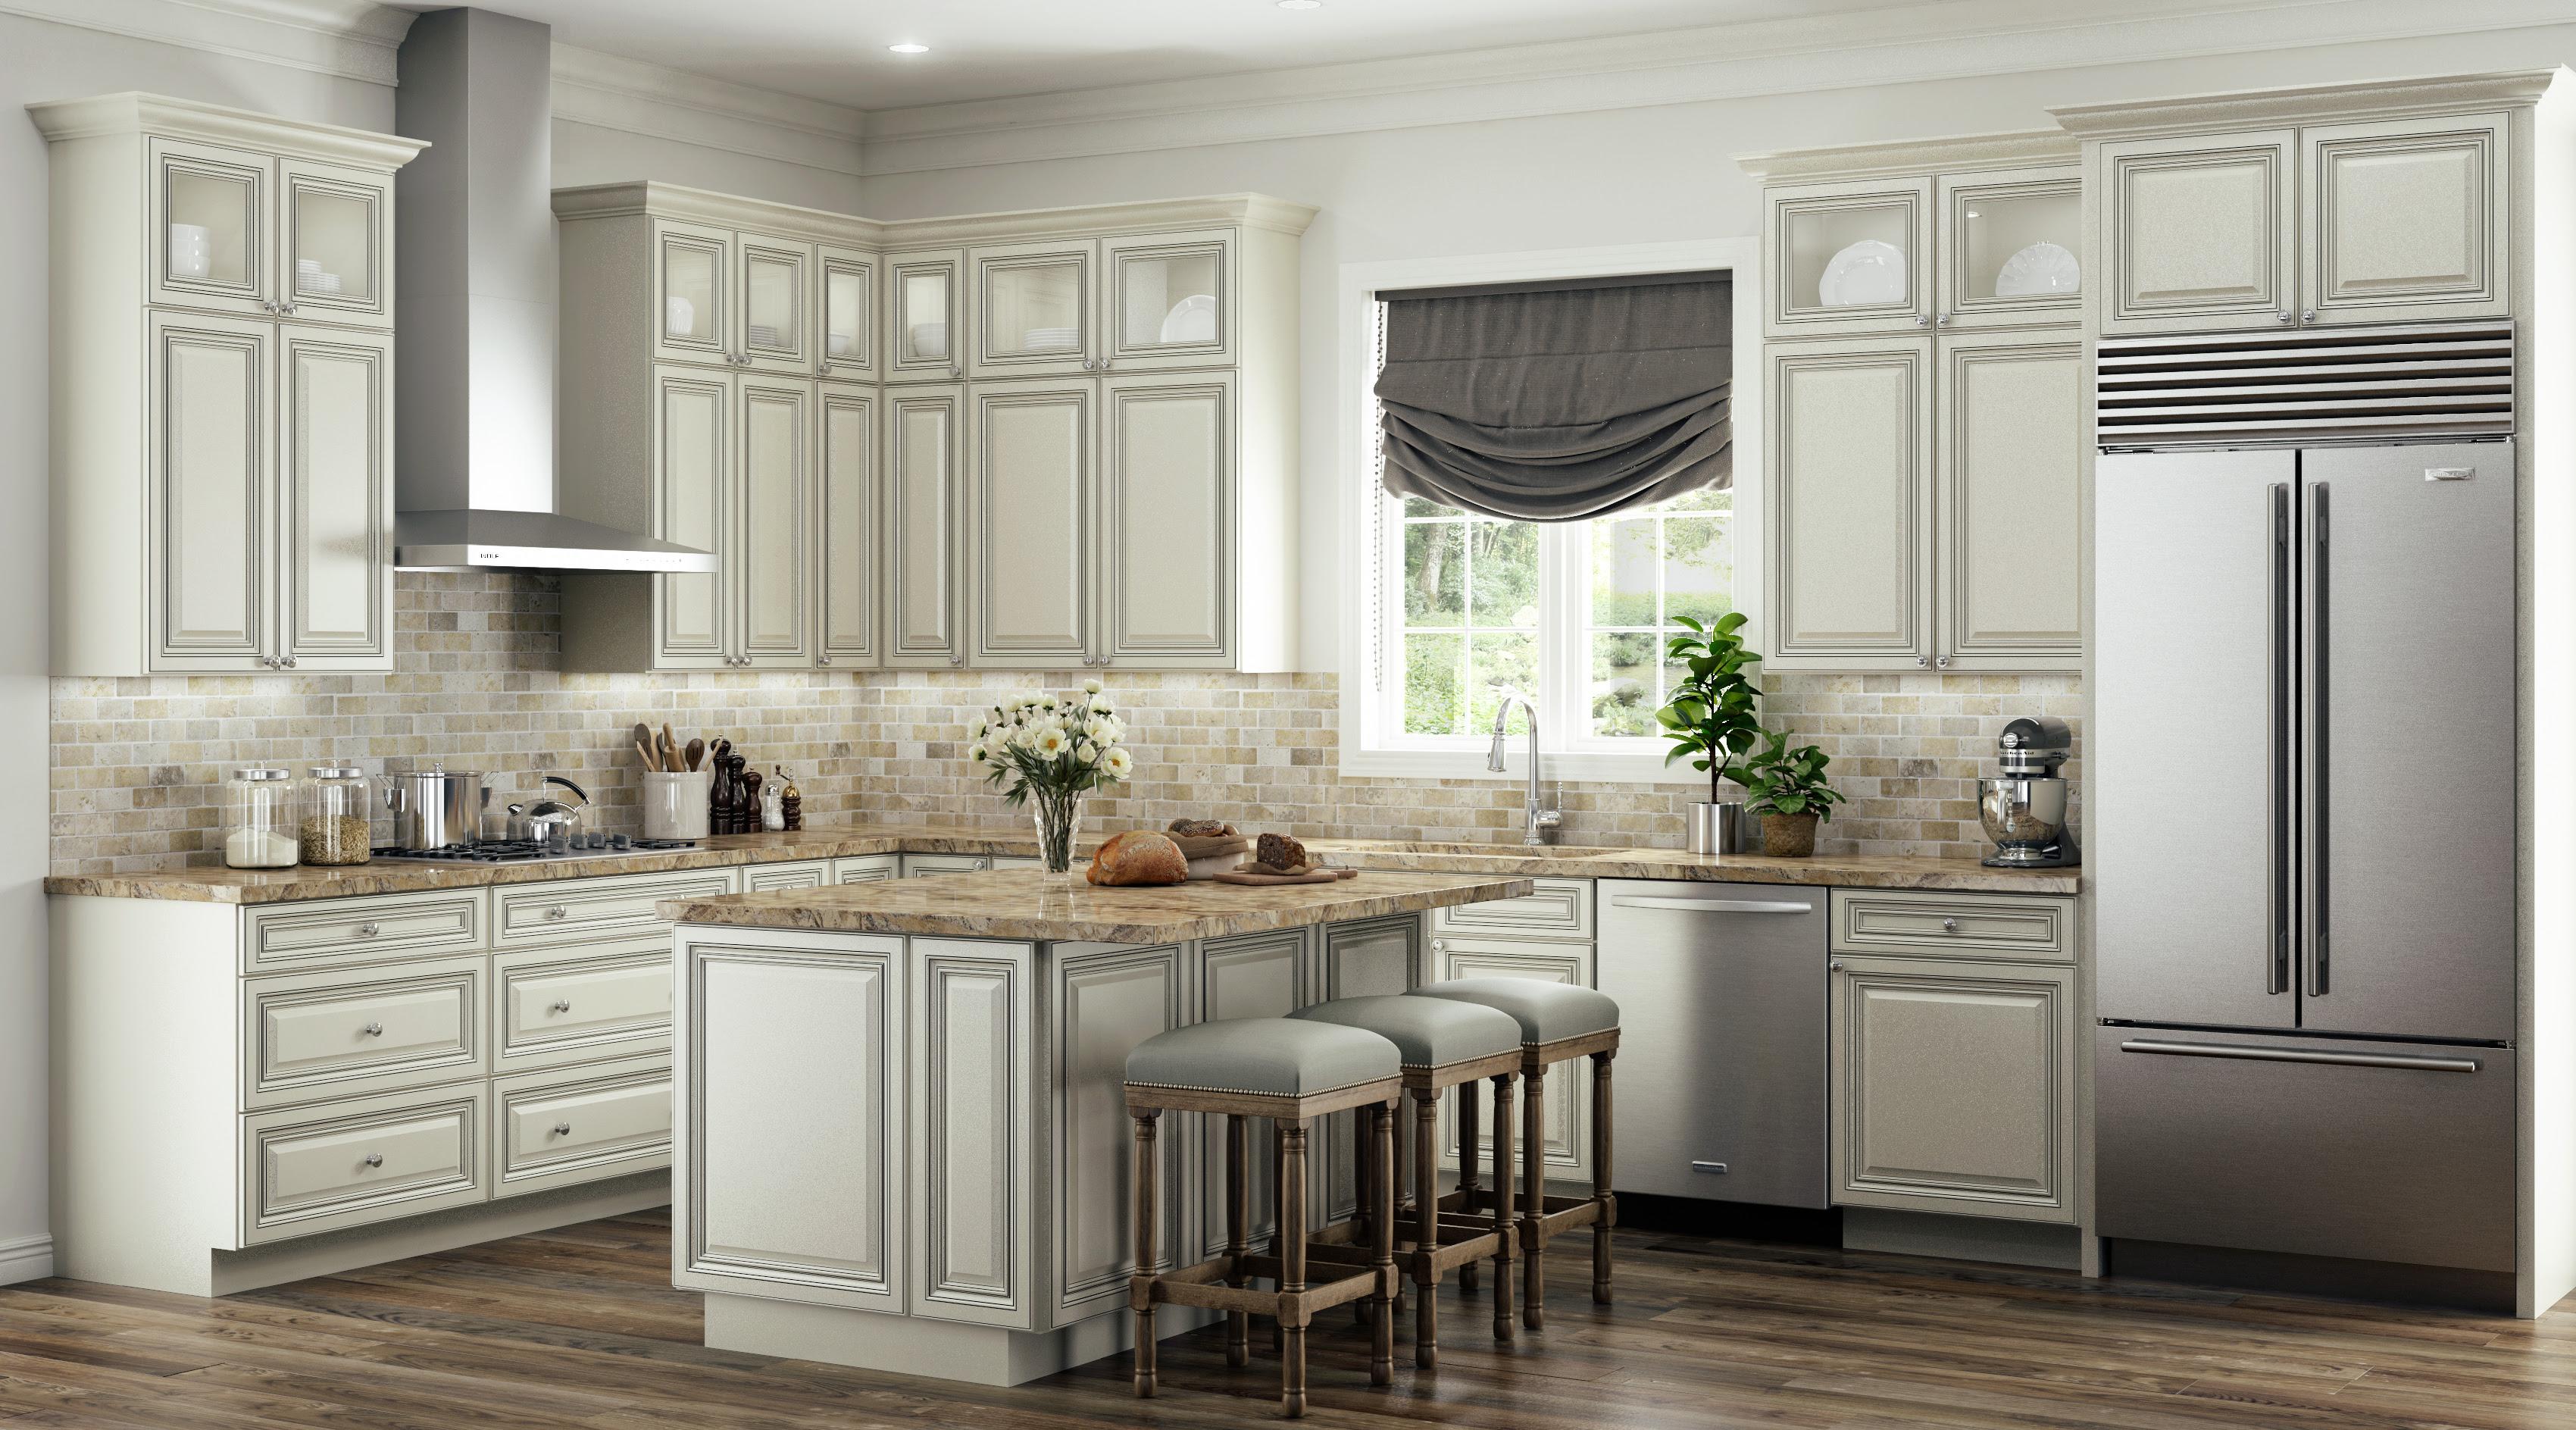 Antique White Glaze - Lesso Kitchen and Bath